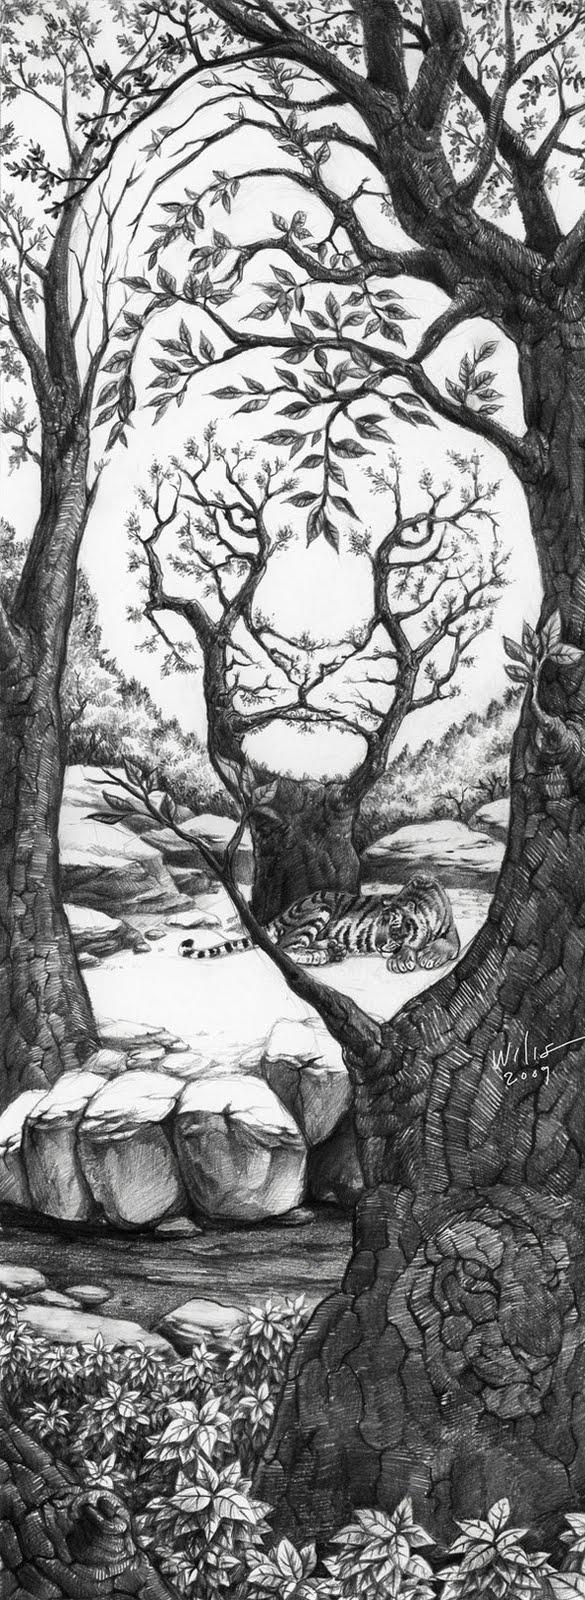 Drawn optical illusion random  its space Drawing TigerIllusion